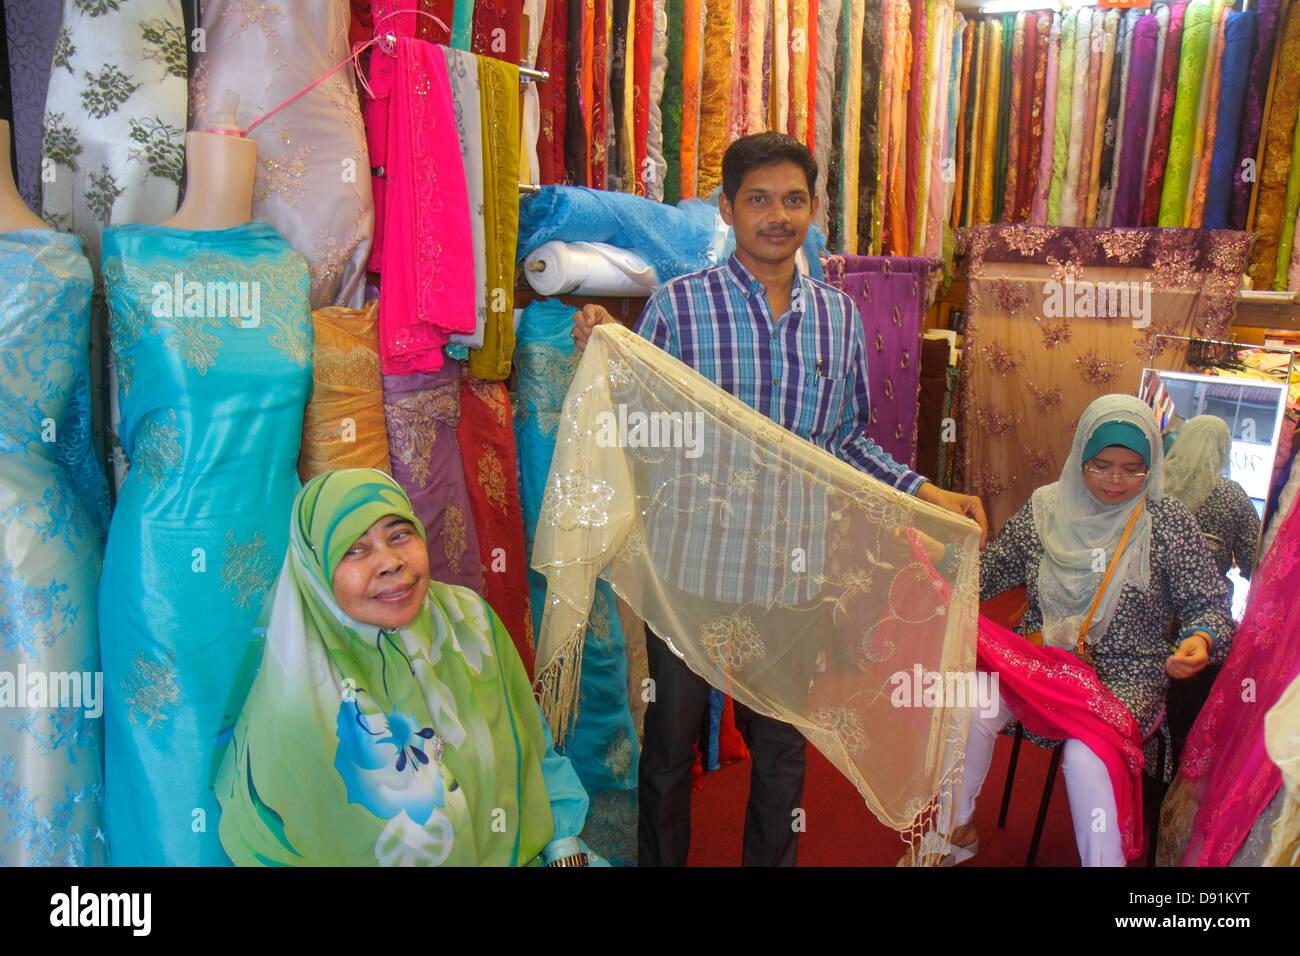 Singapore Kampong Glam Muslim Quarter Arab Street textile